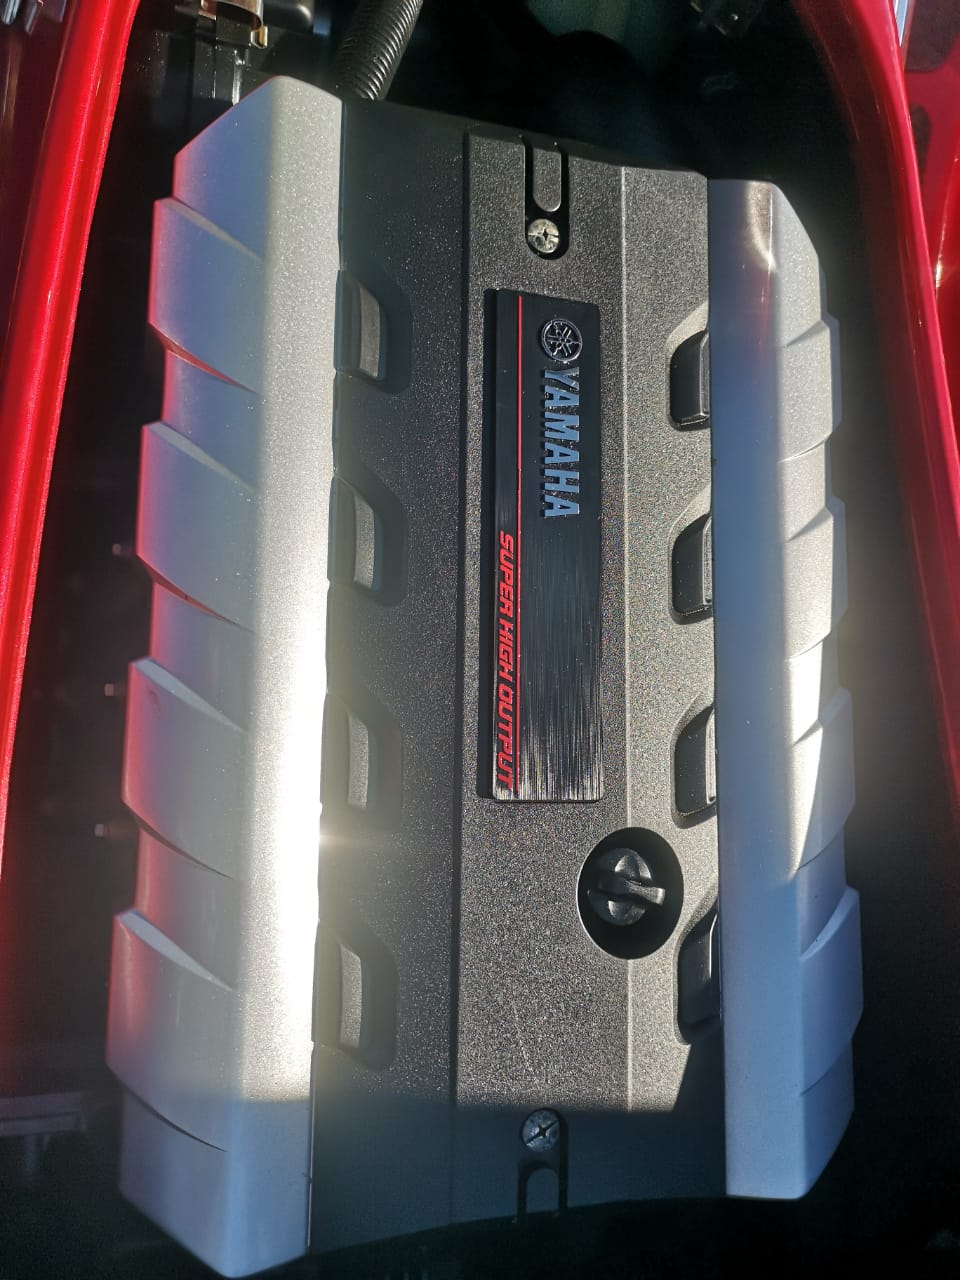 Yamaha FX1800 SHO Supercharged